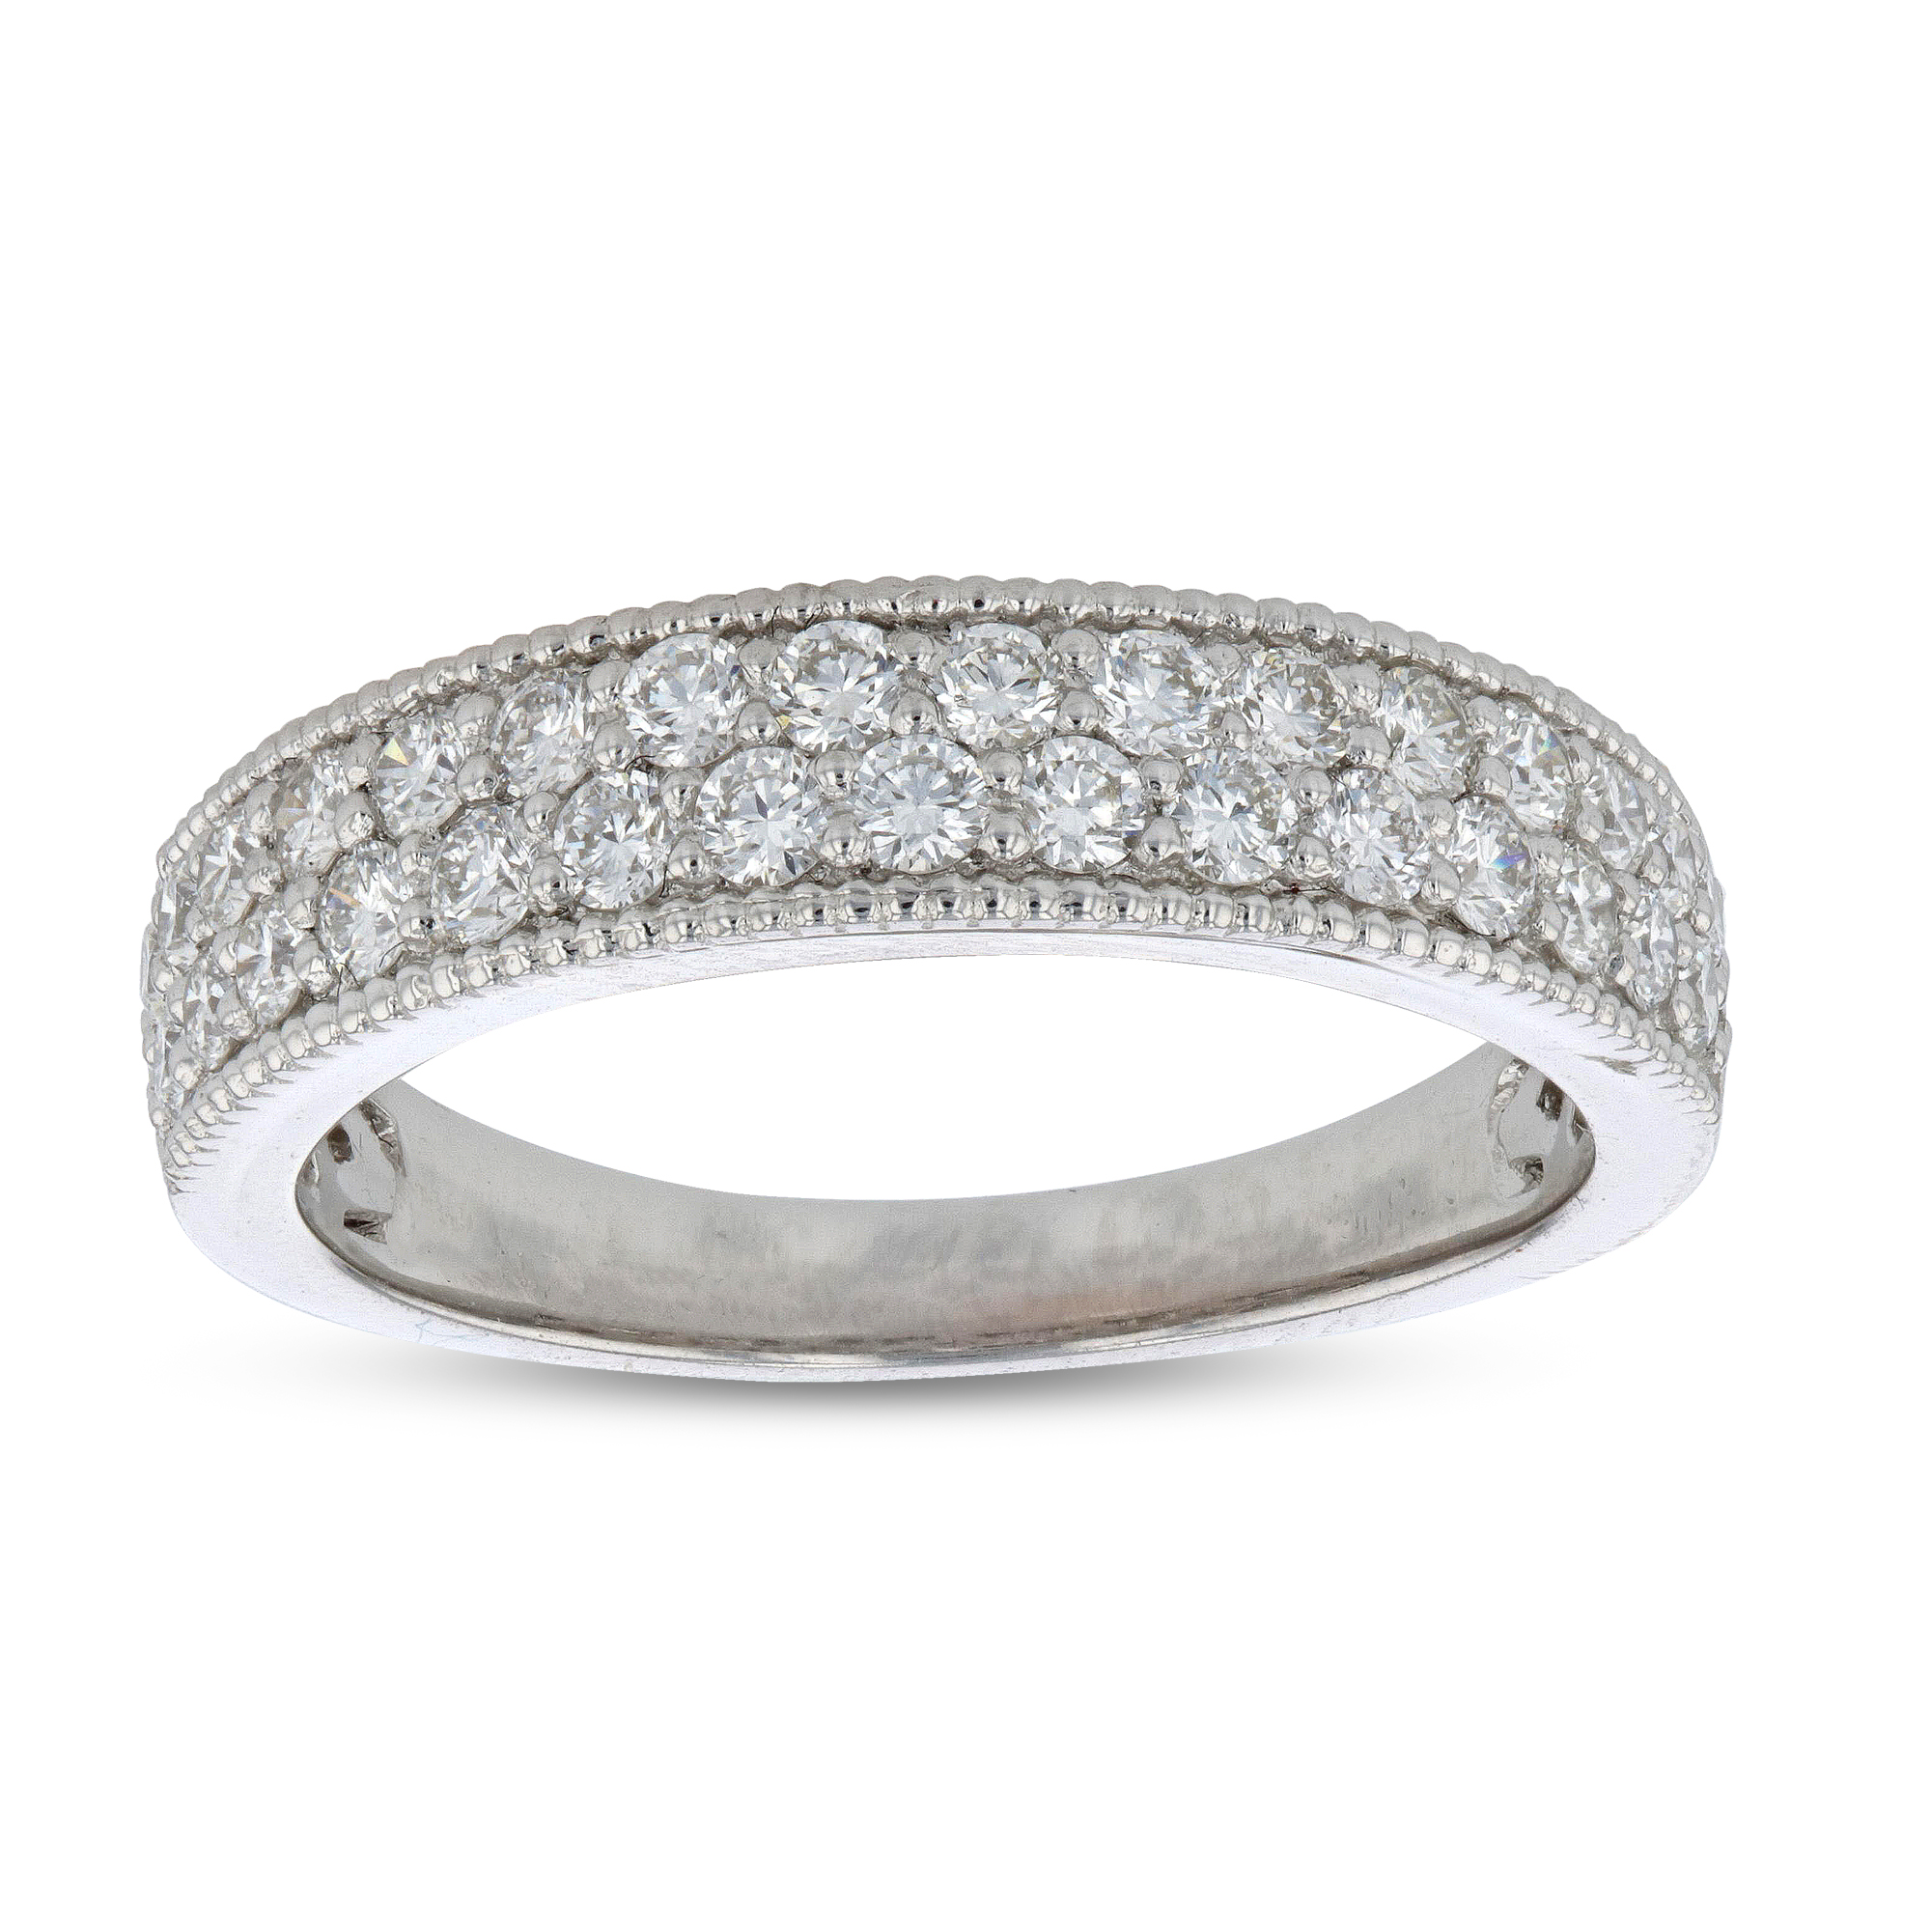 View 0.74ctw Diamond Wedding Band in 18k White Gold